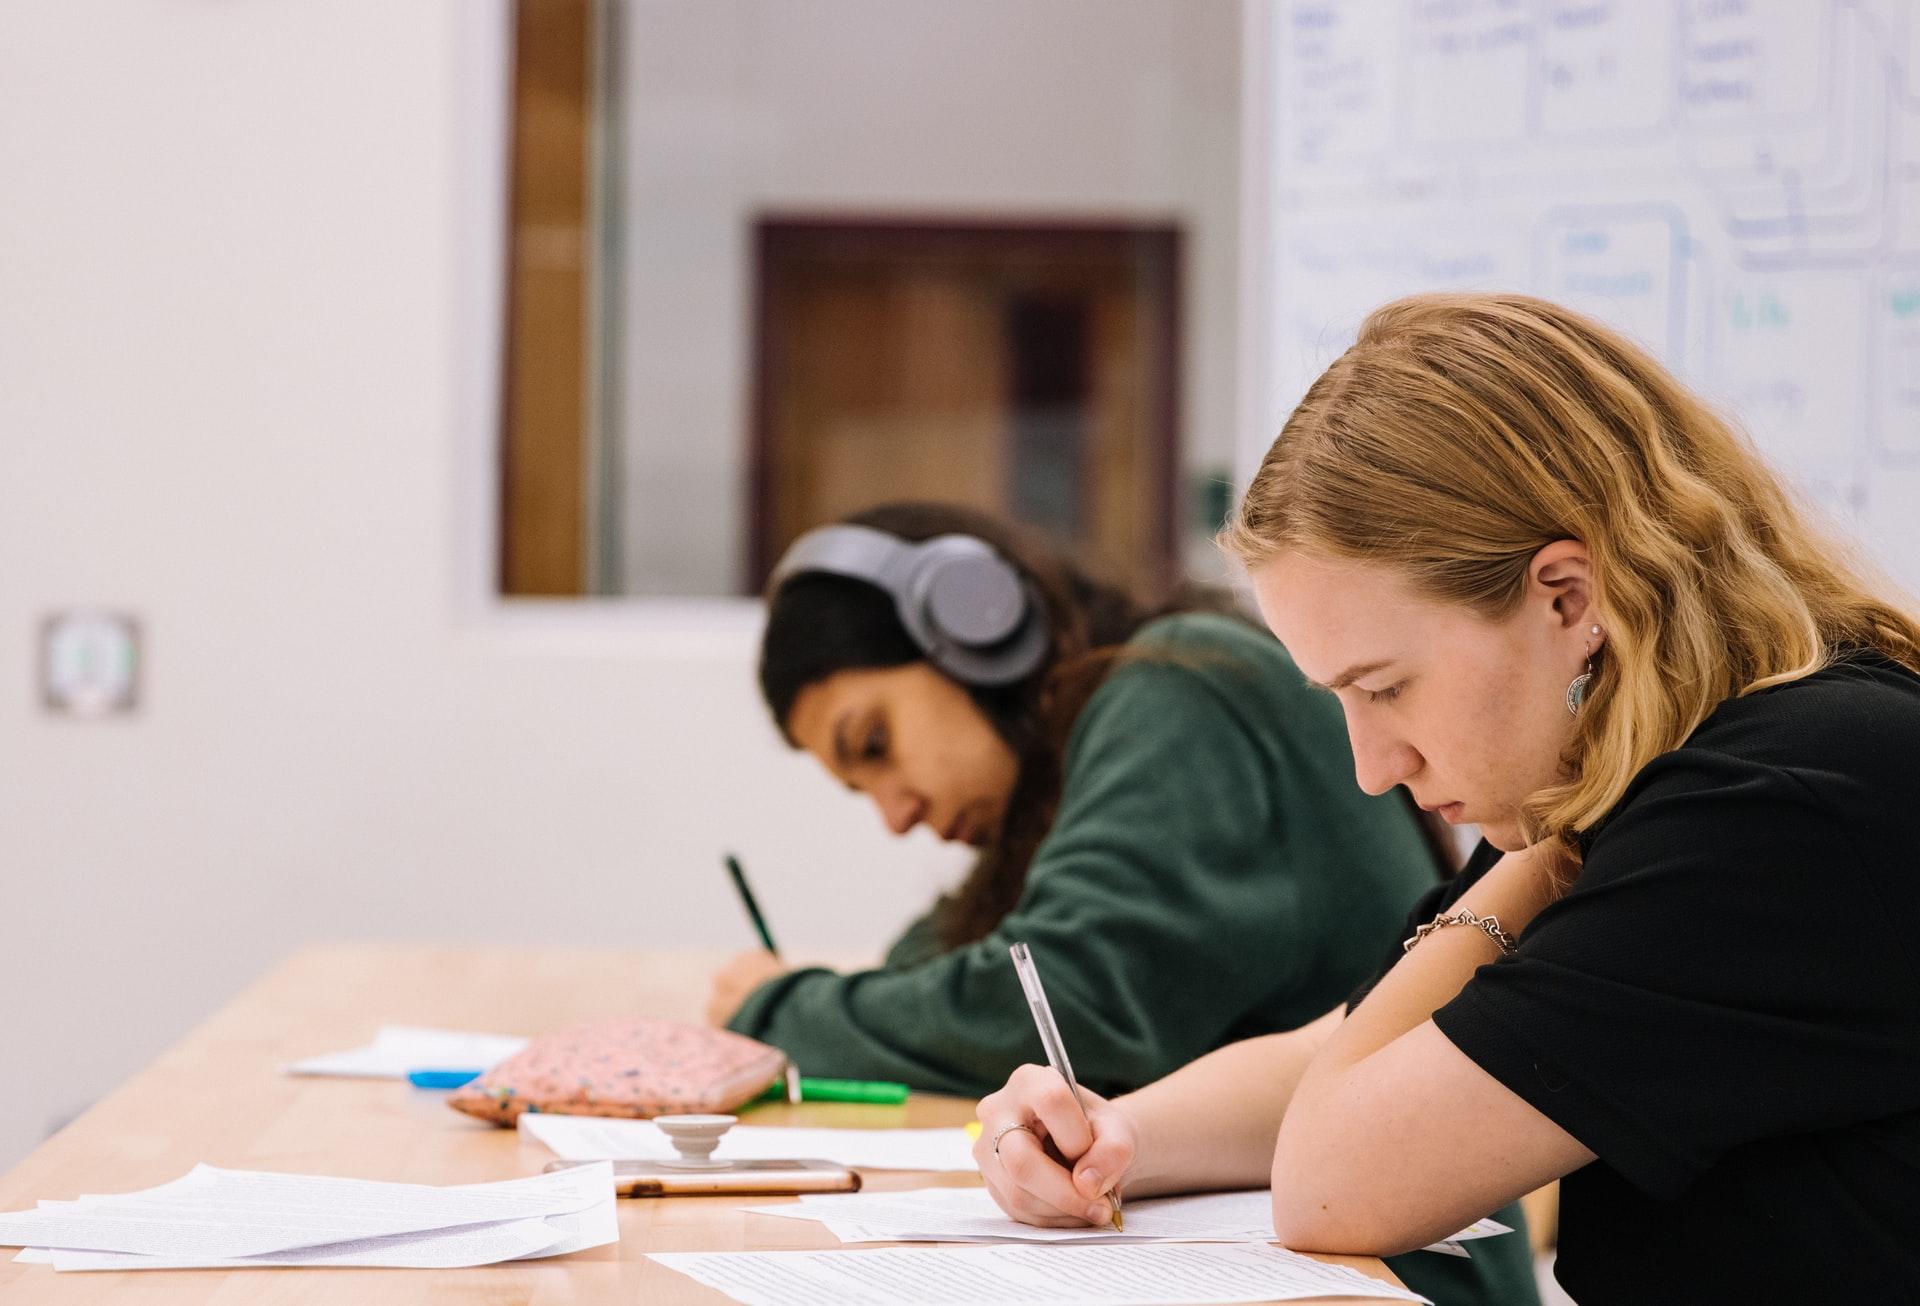 Ilustrasi siswa sedang melakukan ujian. Photo by Jeswin Thomas on Unsplash